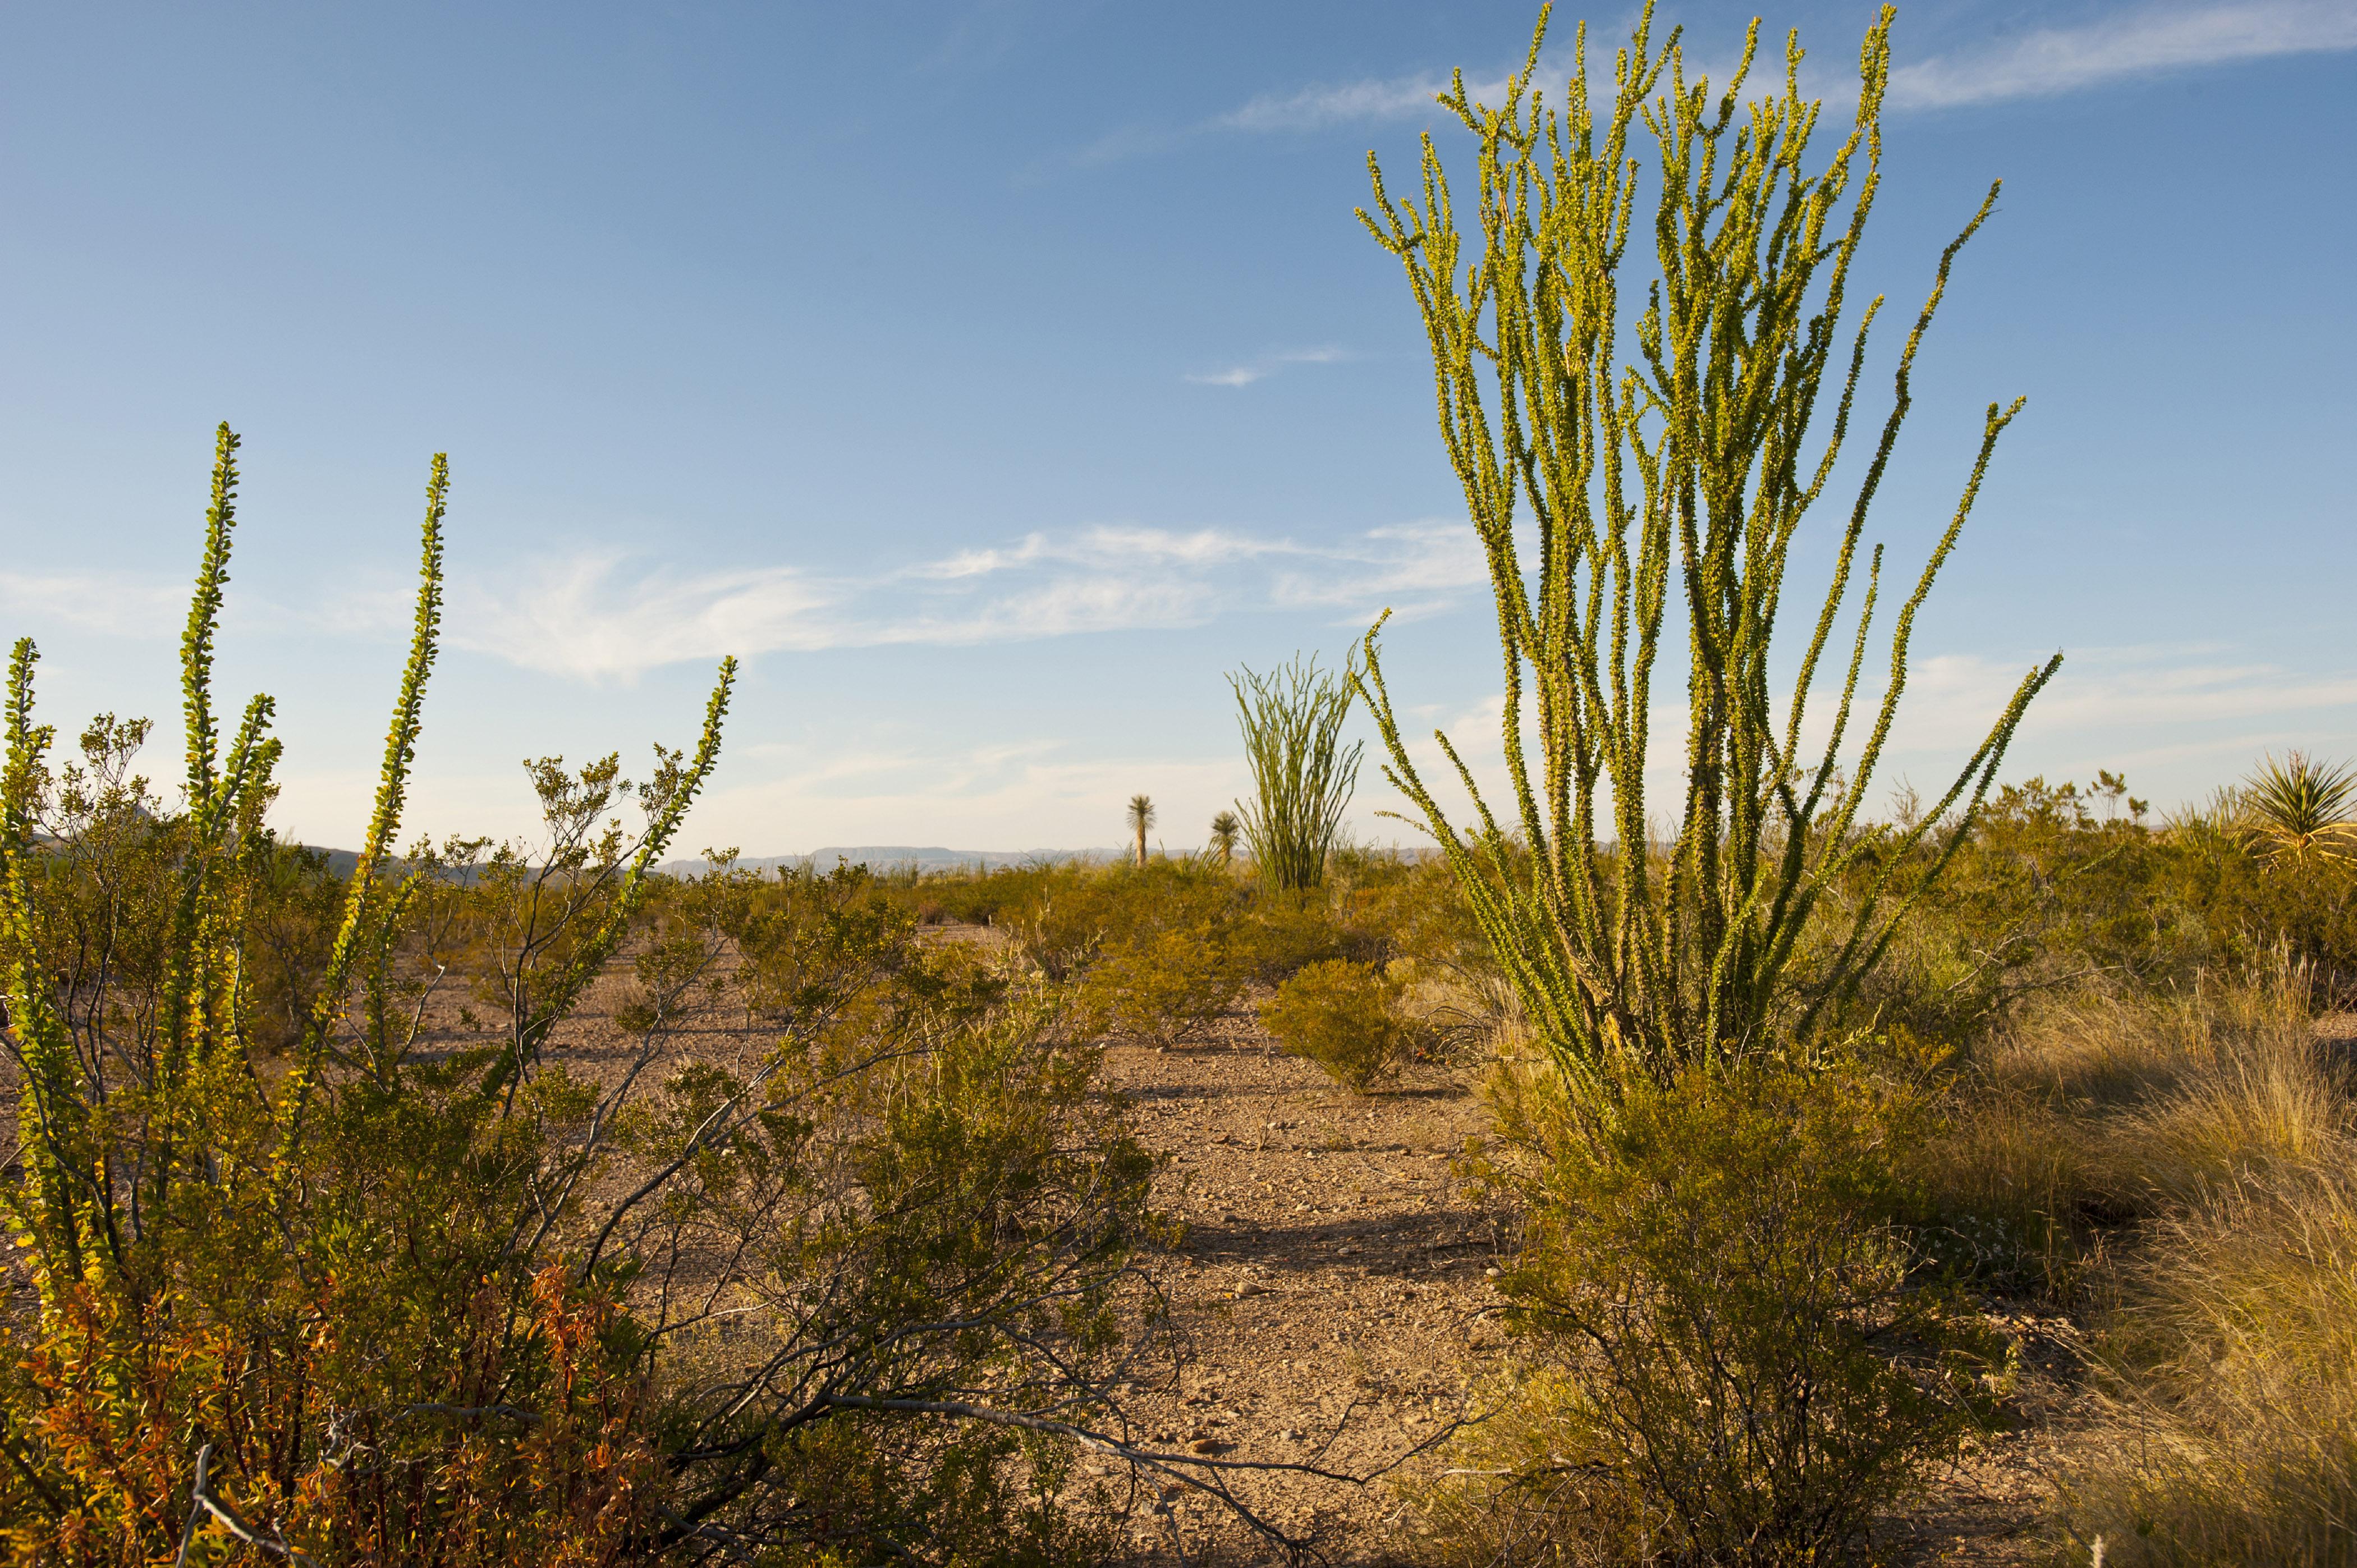 Big Bend National Park, Ocitillo in Chihuahuan Desert